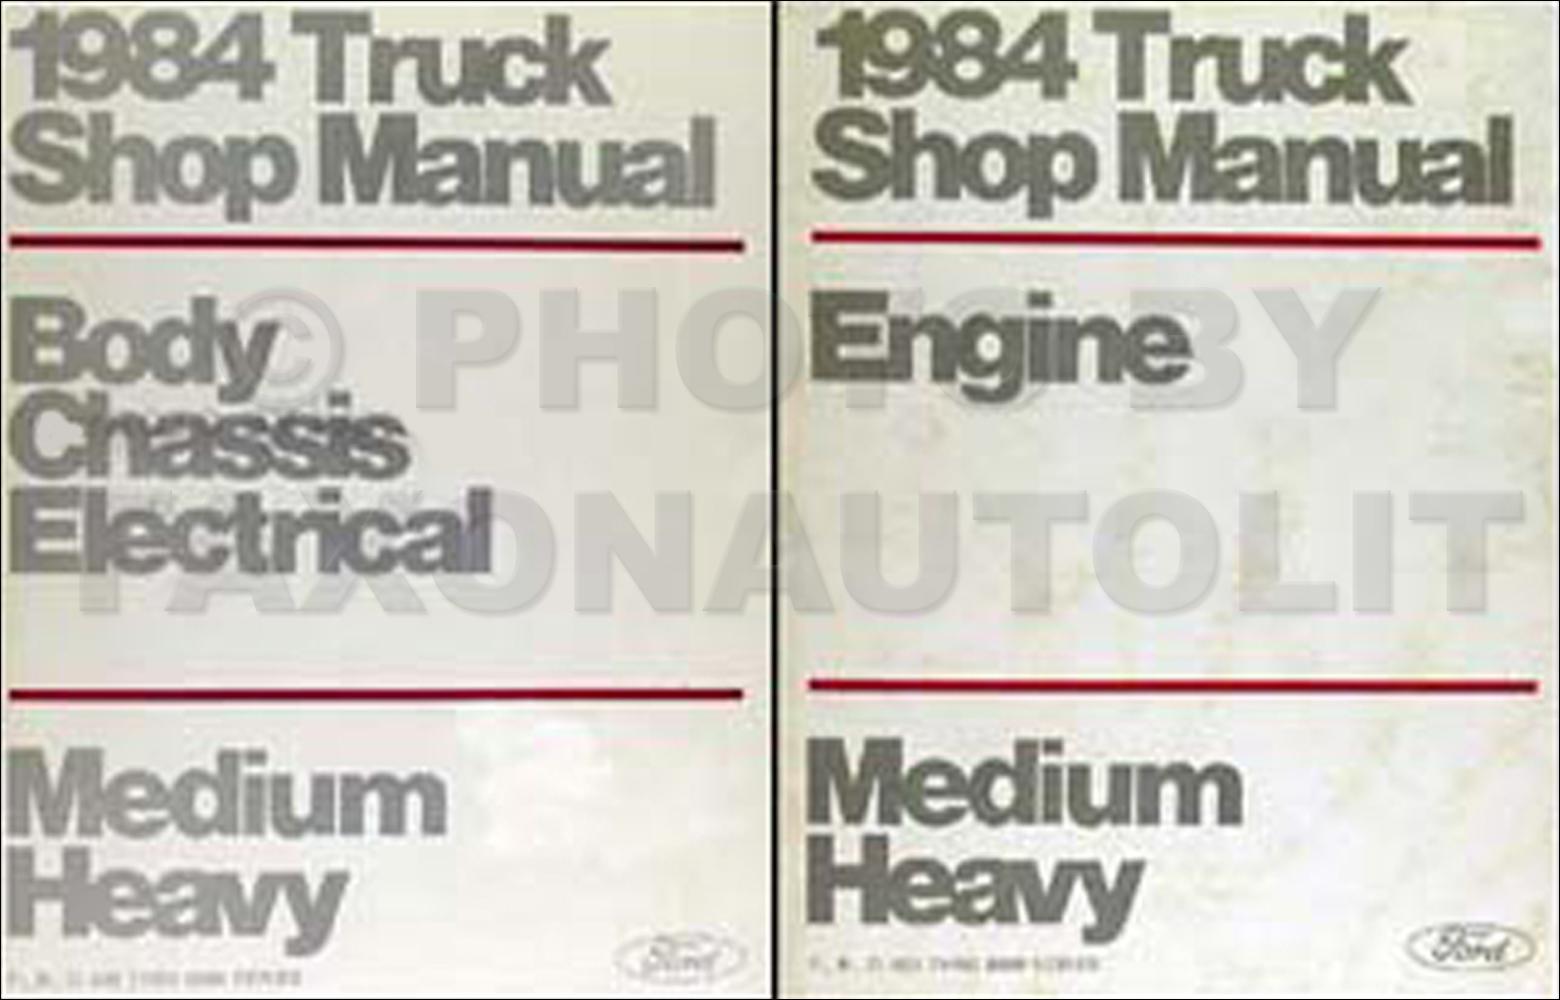 1984 Ford Medium Heavy Truck Original Service